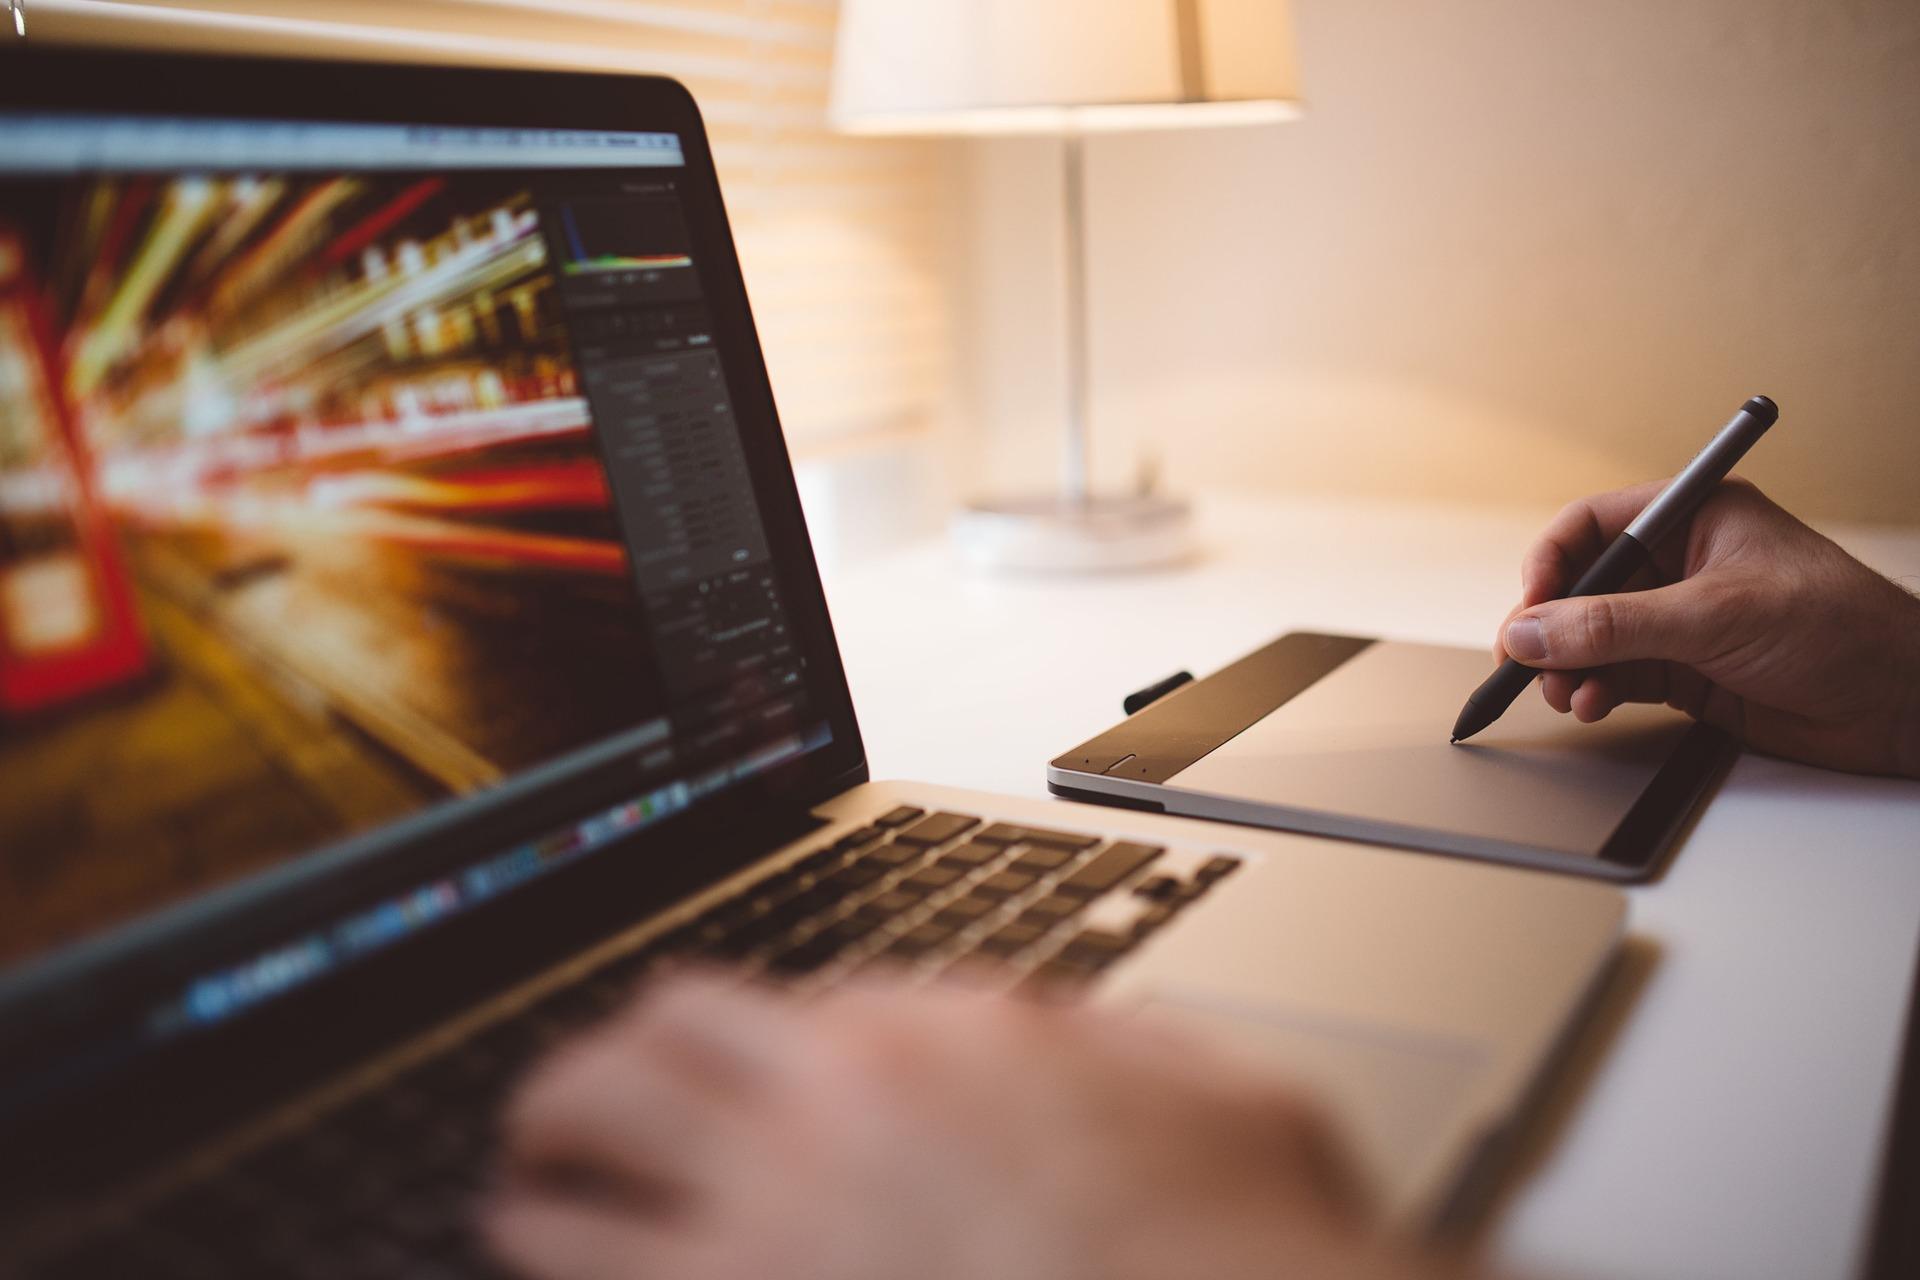 Master 'Digitale Arbeit' -TU Chemnitz startet mit neuem Studiengang